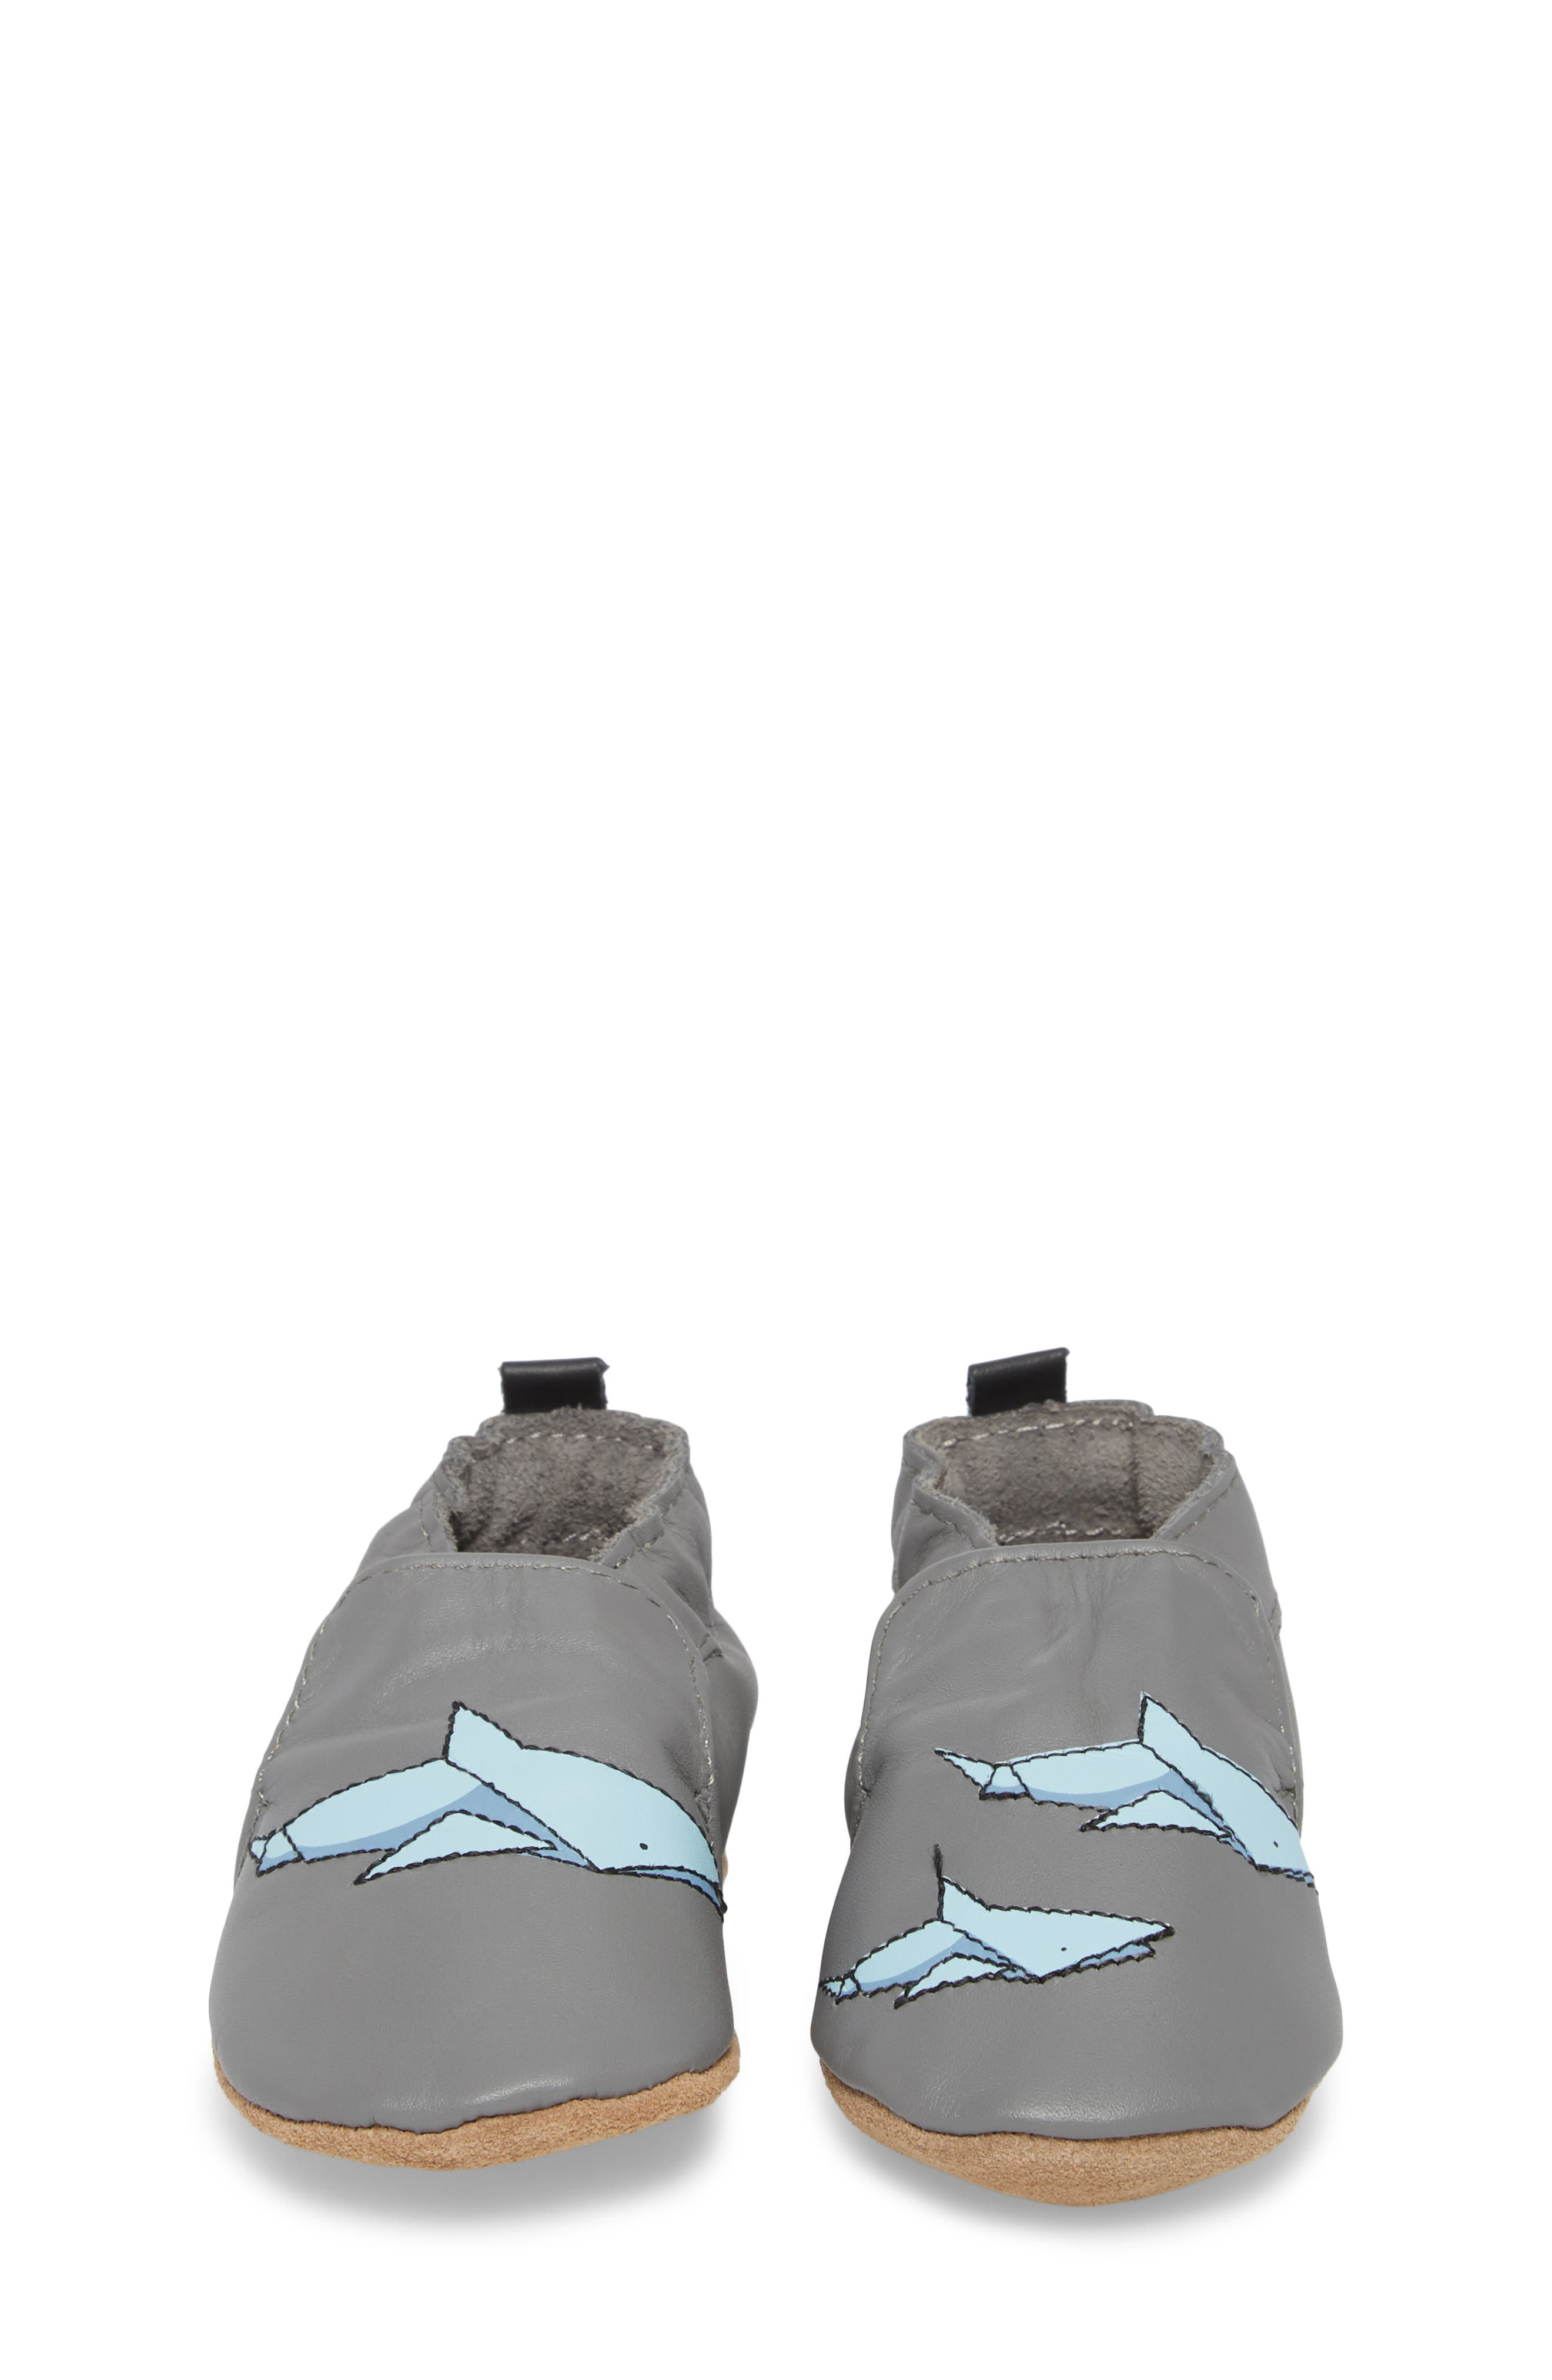 Sharktastic Moccasin Crib Shoe,                             Alternate thumbnail 5, color,                             Grey